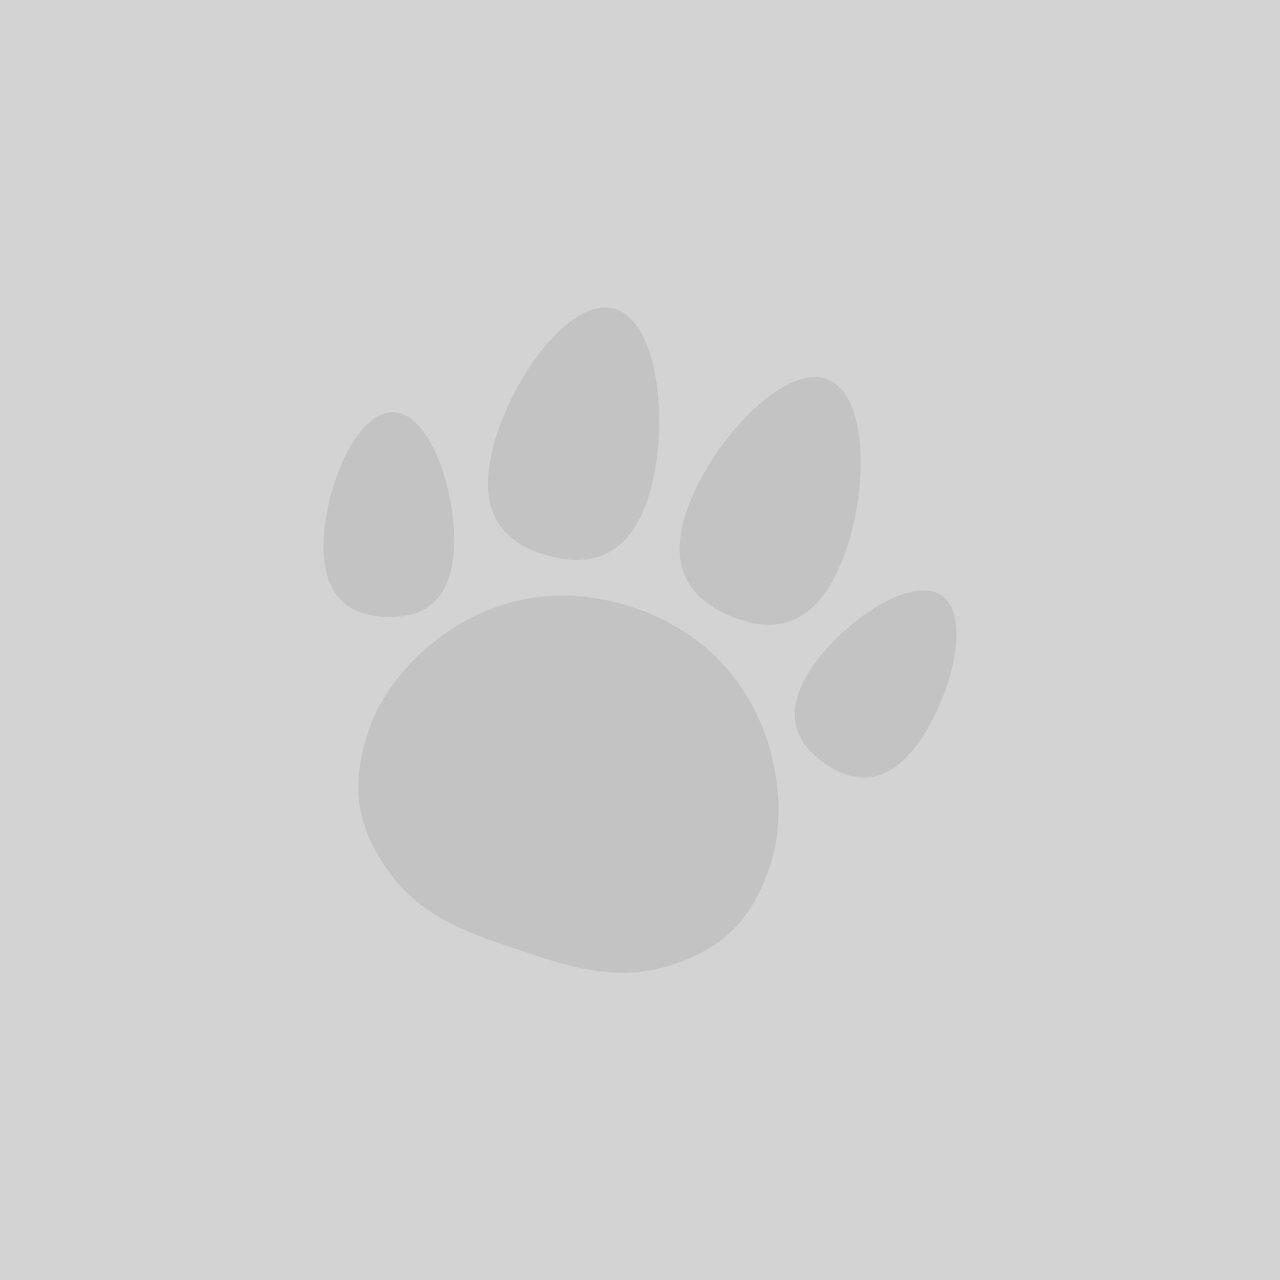 Webbox Cats Delight Tasty Sticks Turkey & Lamb 6 Pack